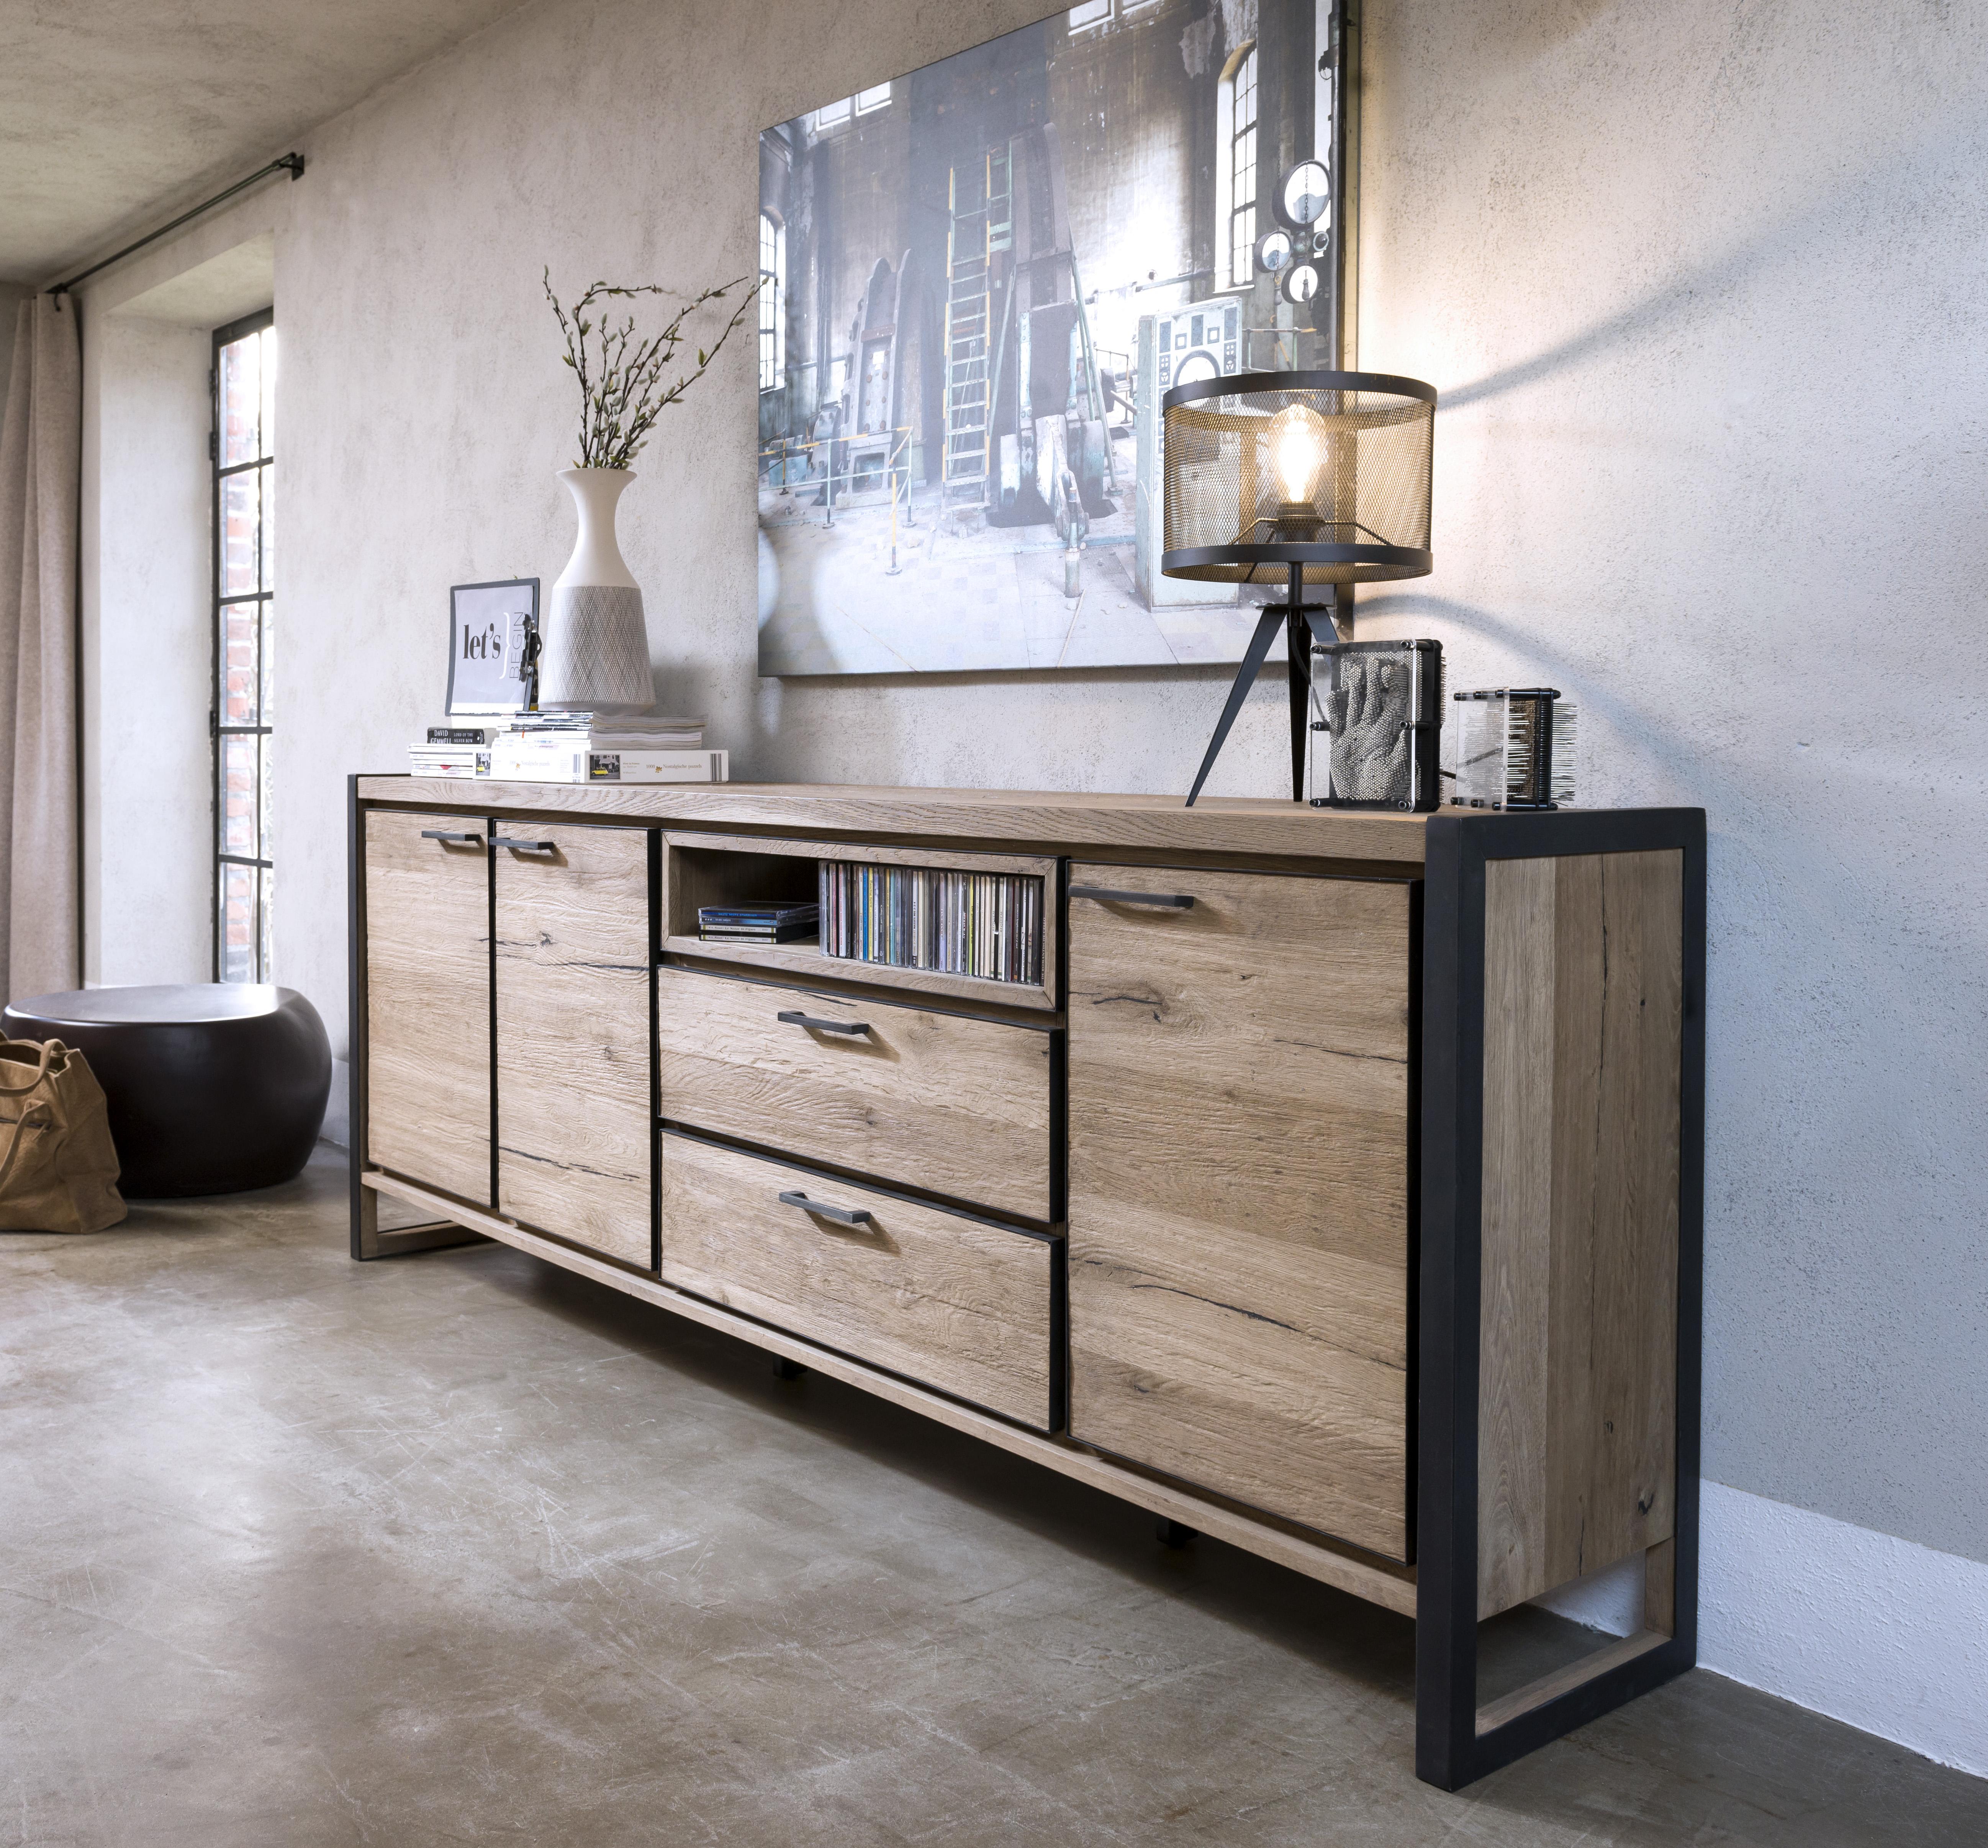 HEN_36330_Metalo_dressoir